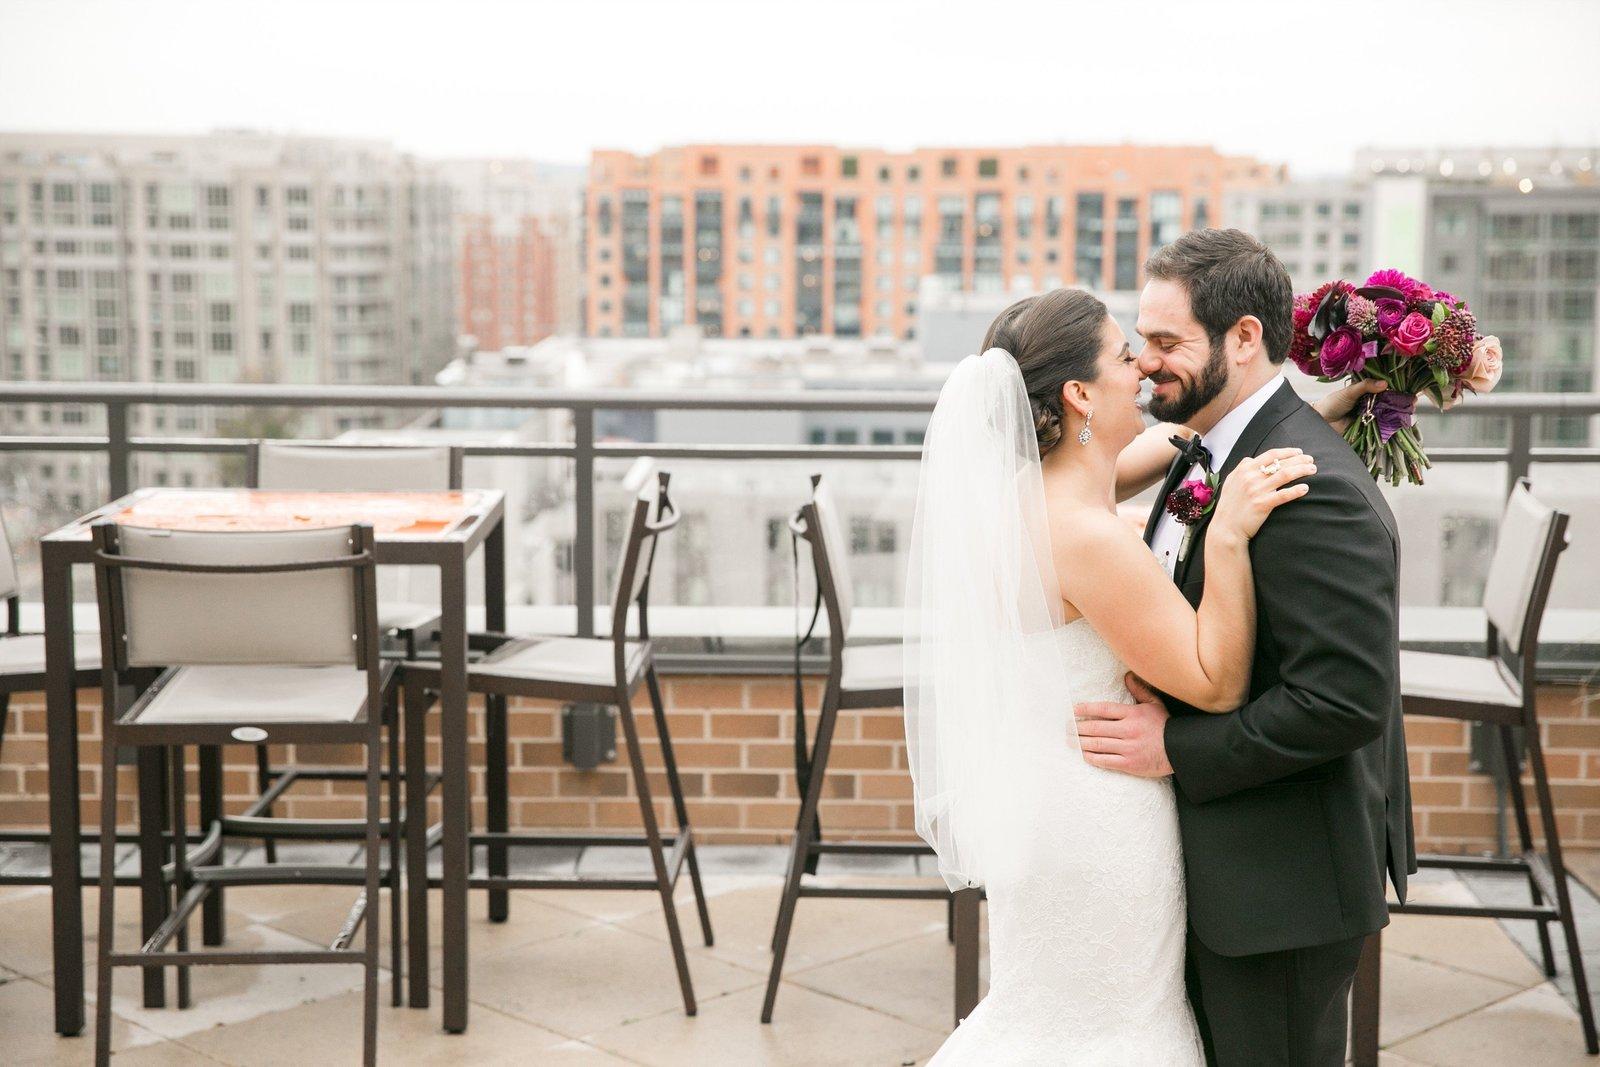 Black-tie-wedding-photos-longview-gallery-dc (135)